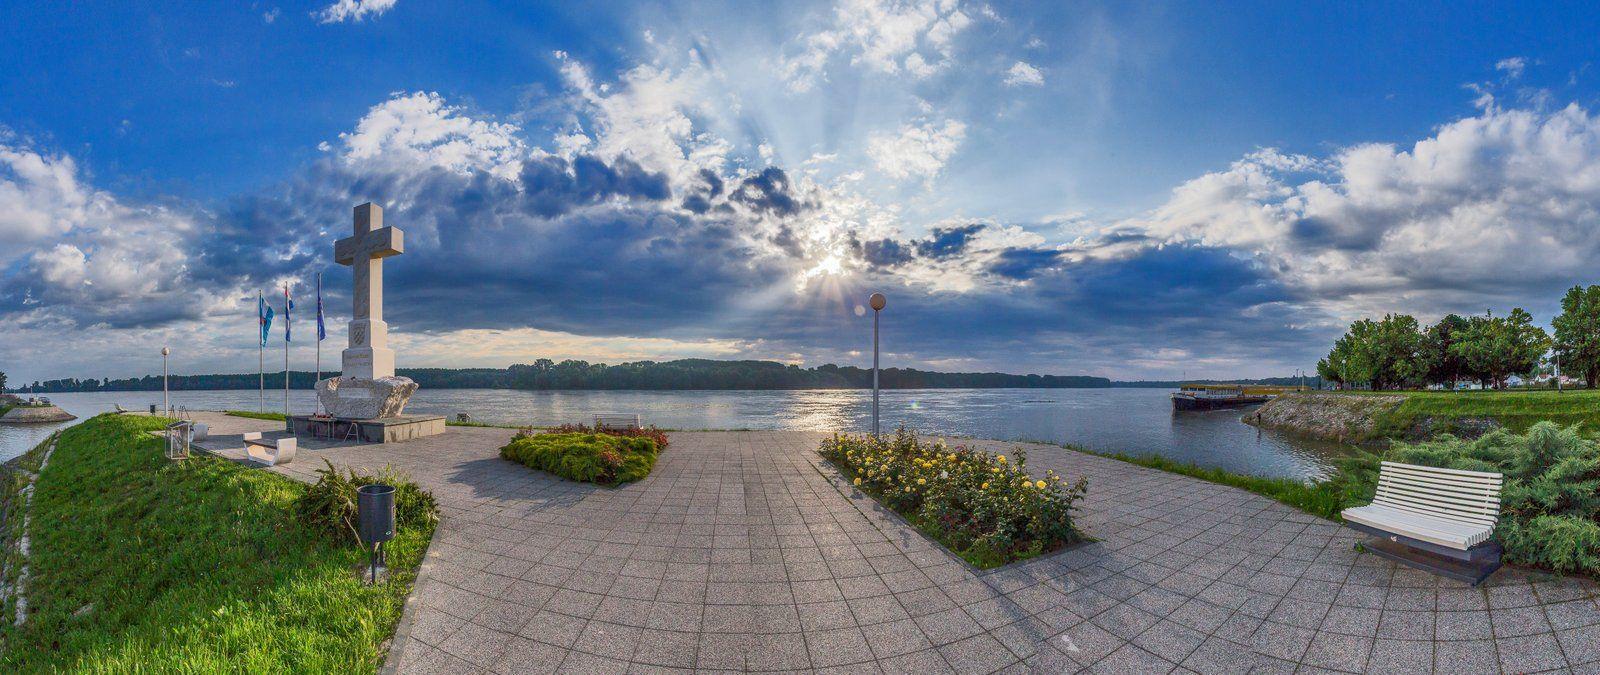 Križ na Dunavu Vukovar